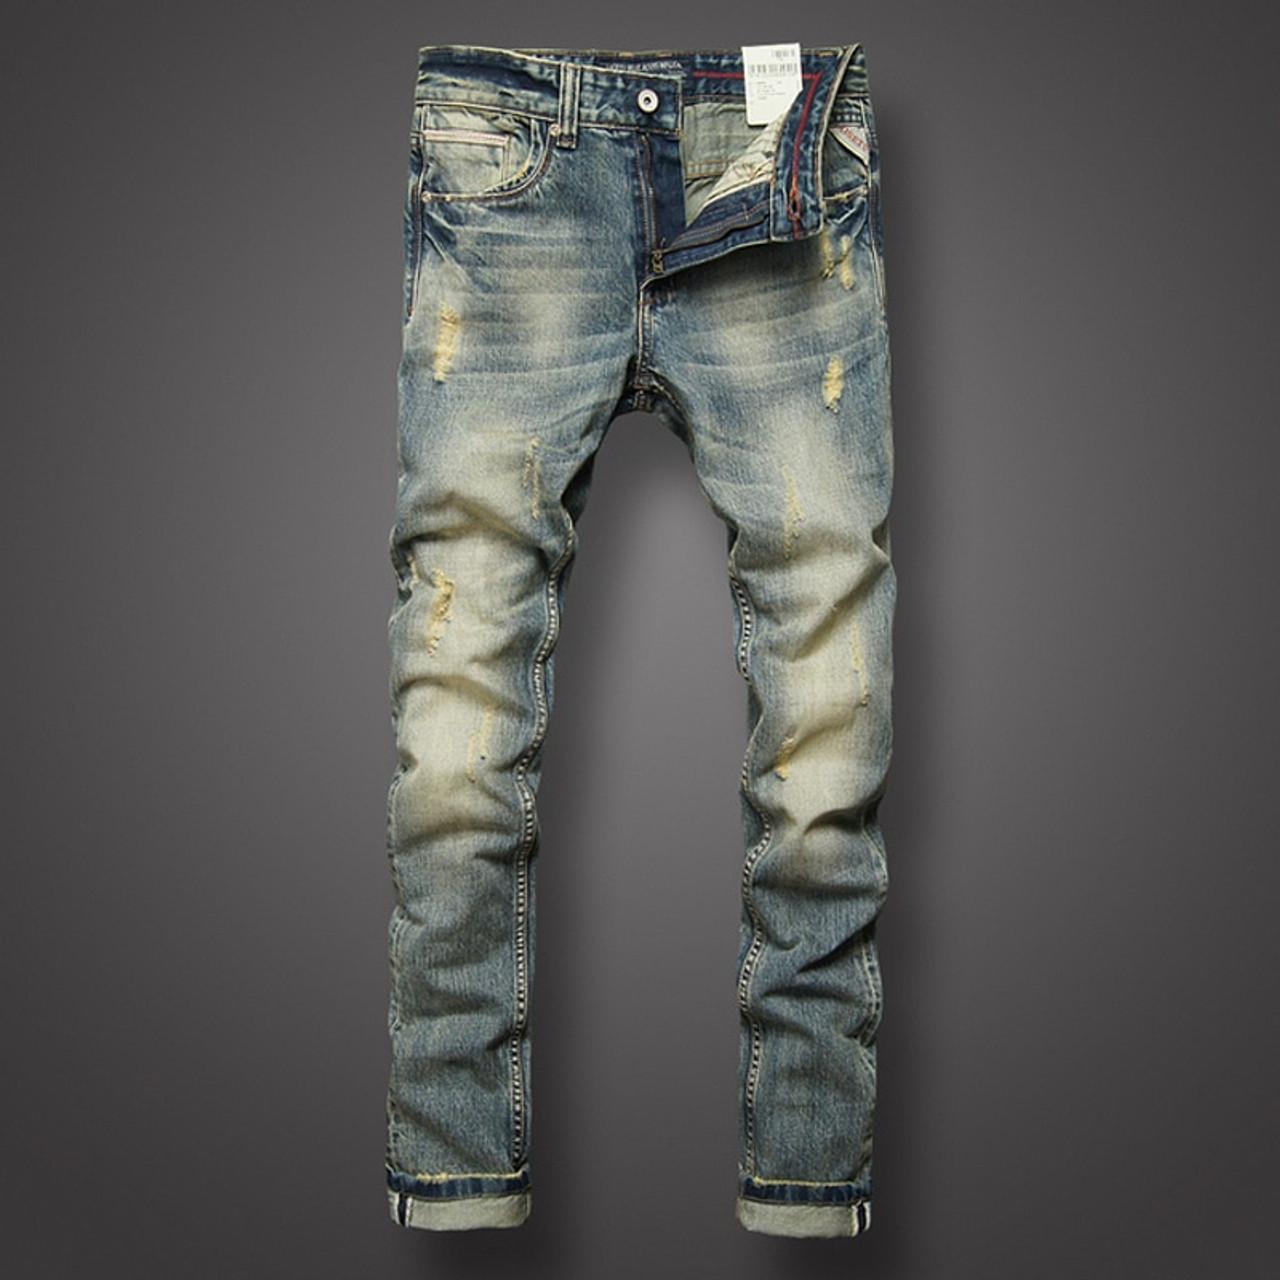 1b769bf36a0 ... Italian Style Fashion Mens Jeans Retro Design Slim Fit Denim Ripped  Jeans Mens Pants Brand Clothing ...